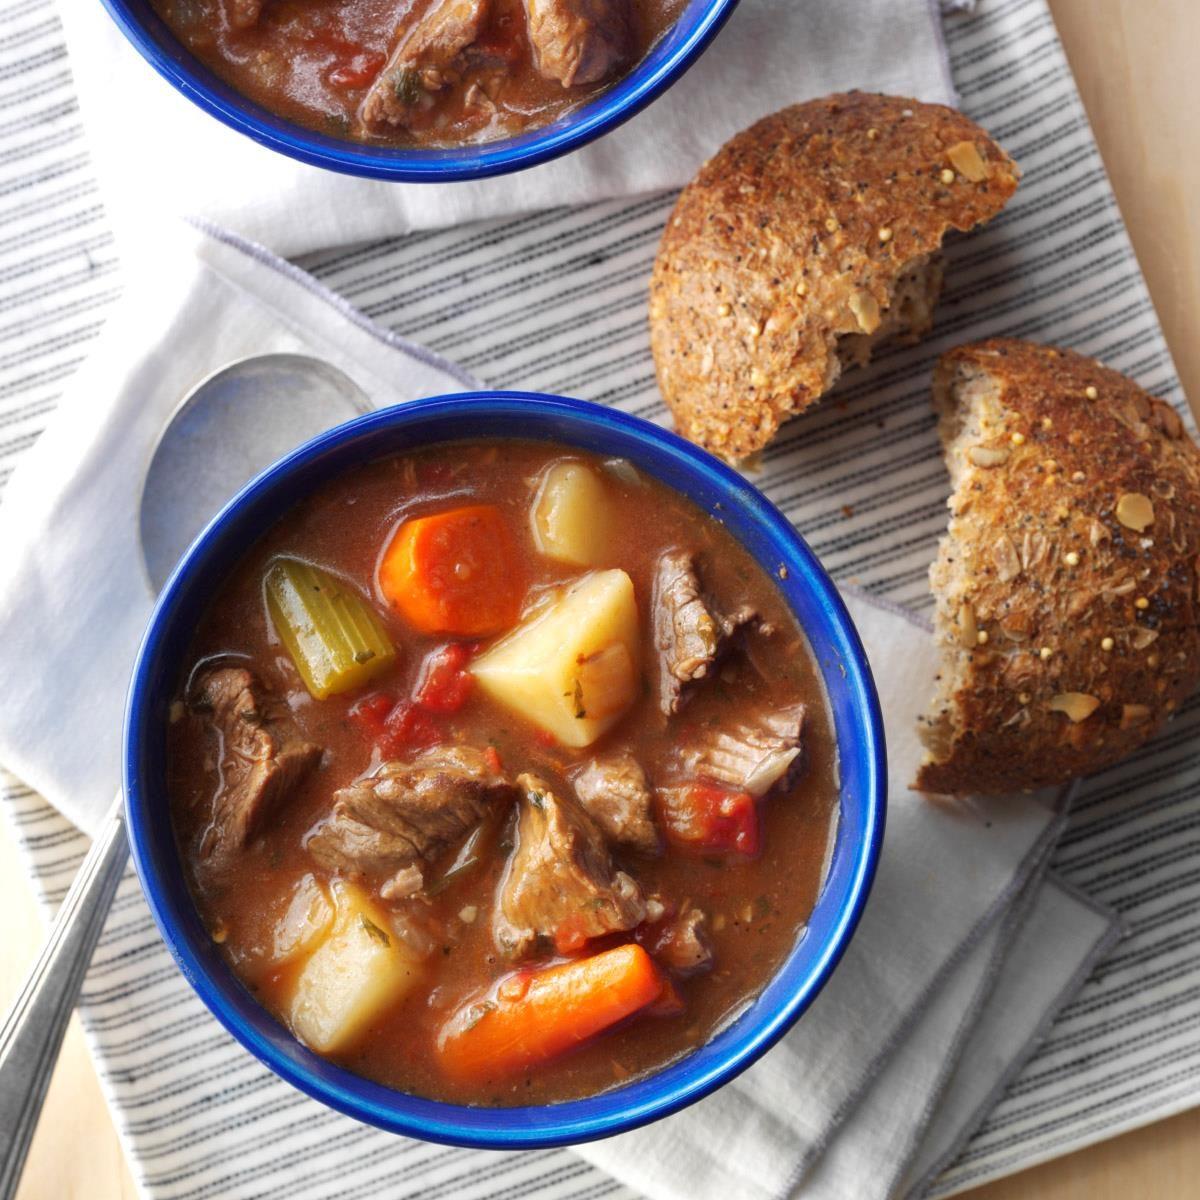 Classic Beef Stew Recipe | Taste of Home